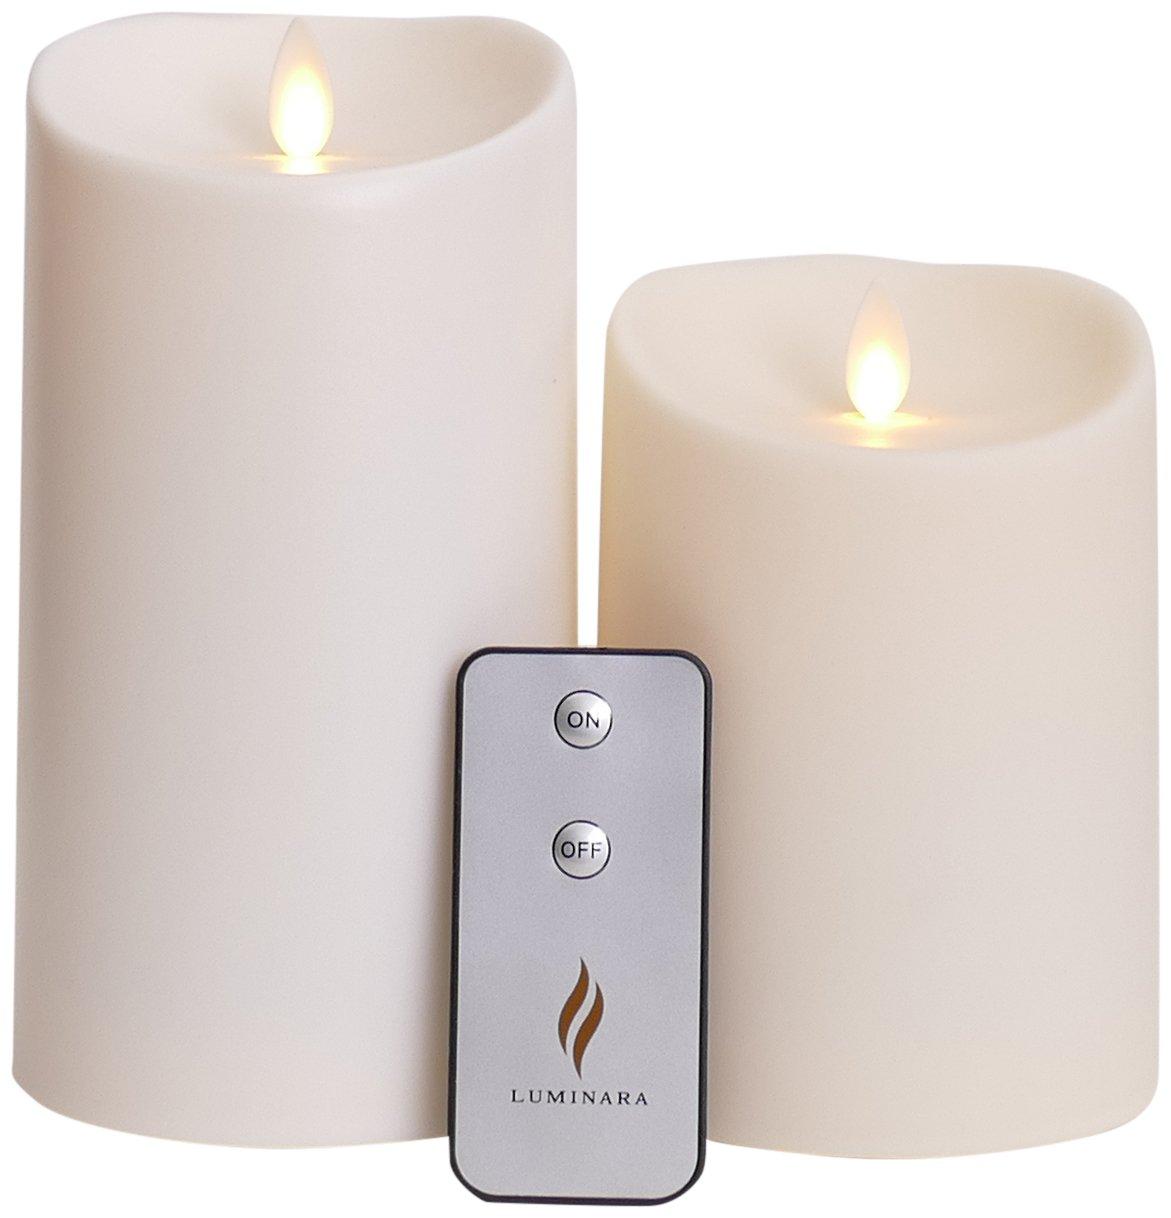 Get Quotations · Set Of 2 Luminara Outdoor Flameless Candles: 3.75x5 3.75x7  Outdoor Flameless Candles With